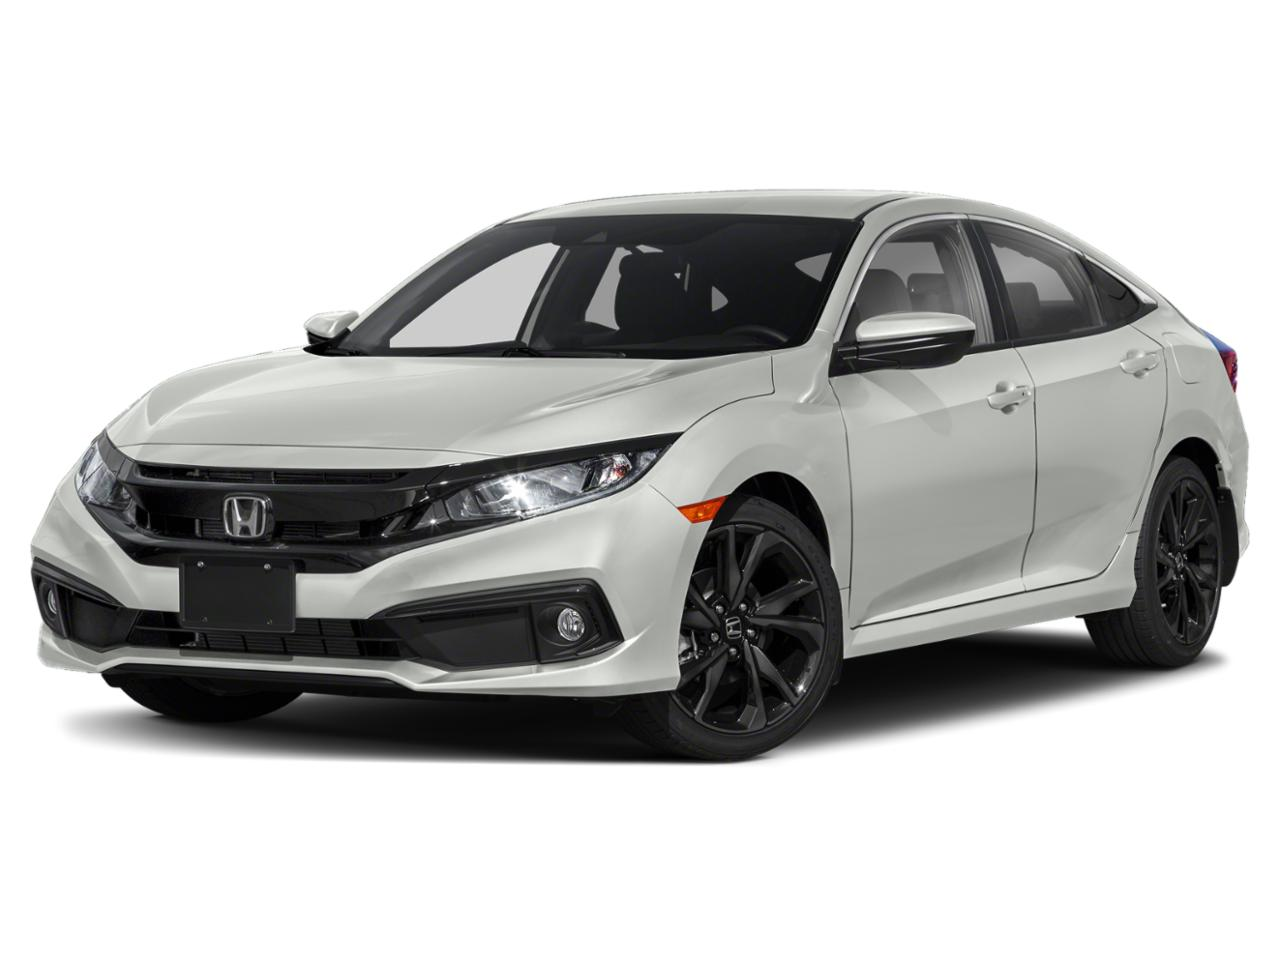 2020 Honda Civic Sedan Vehicle Photo in MEDINA, OH 44256-9631